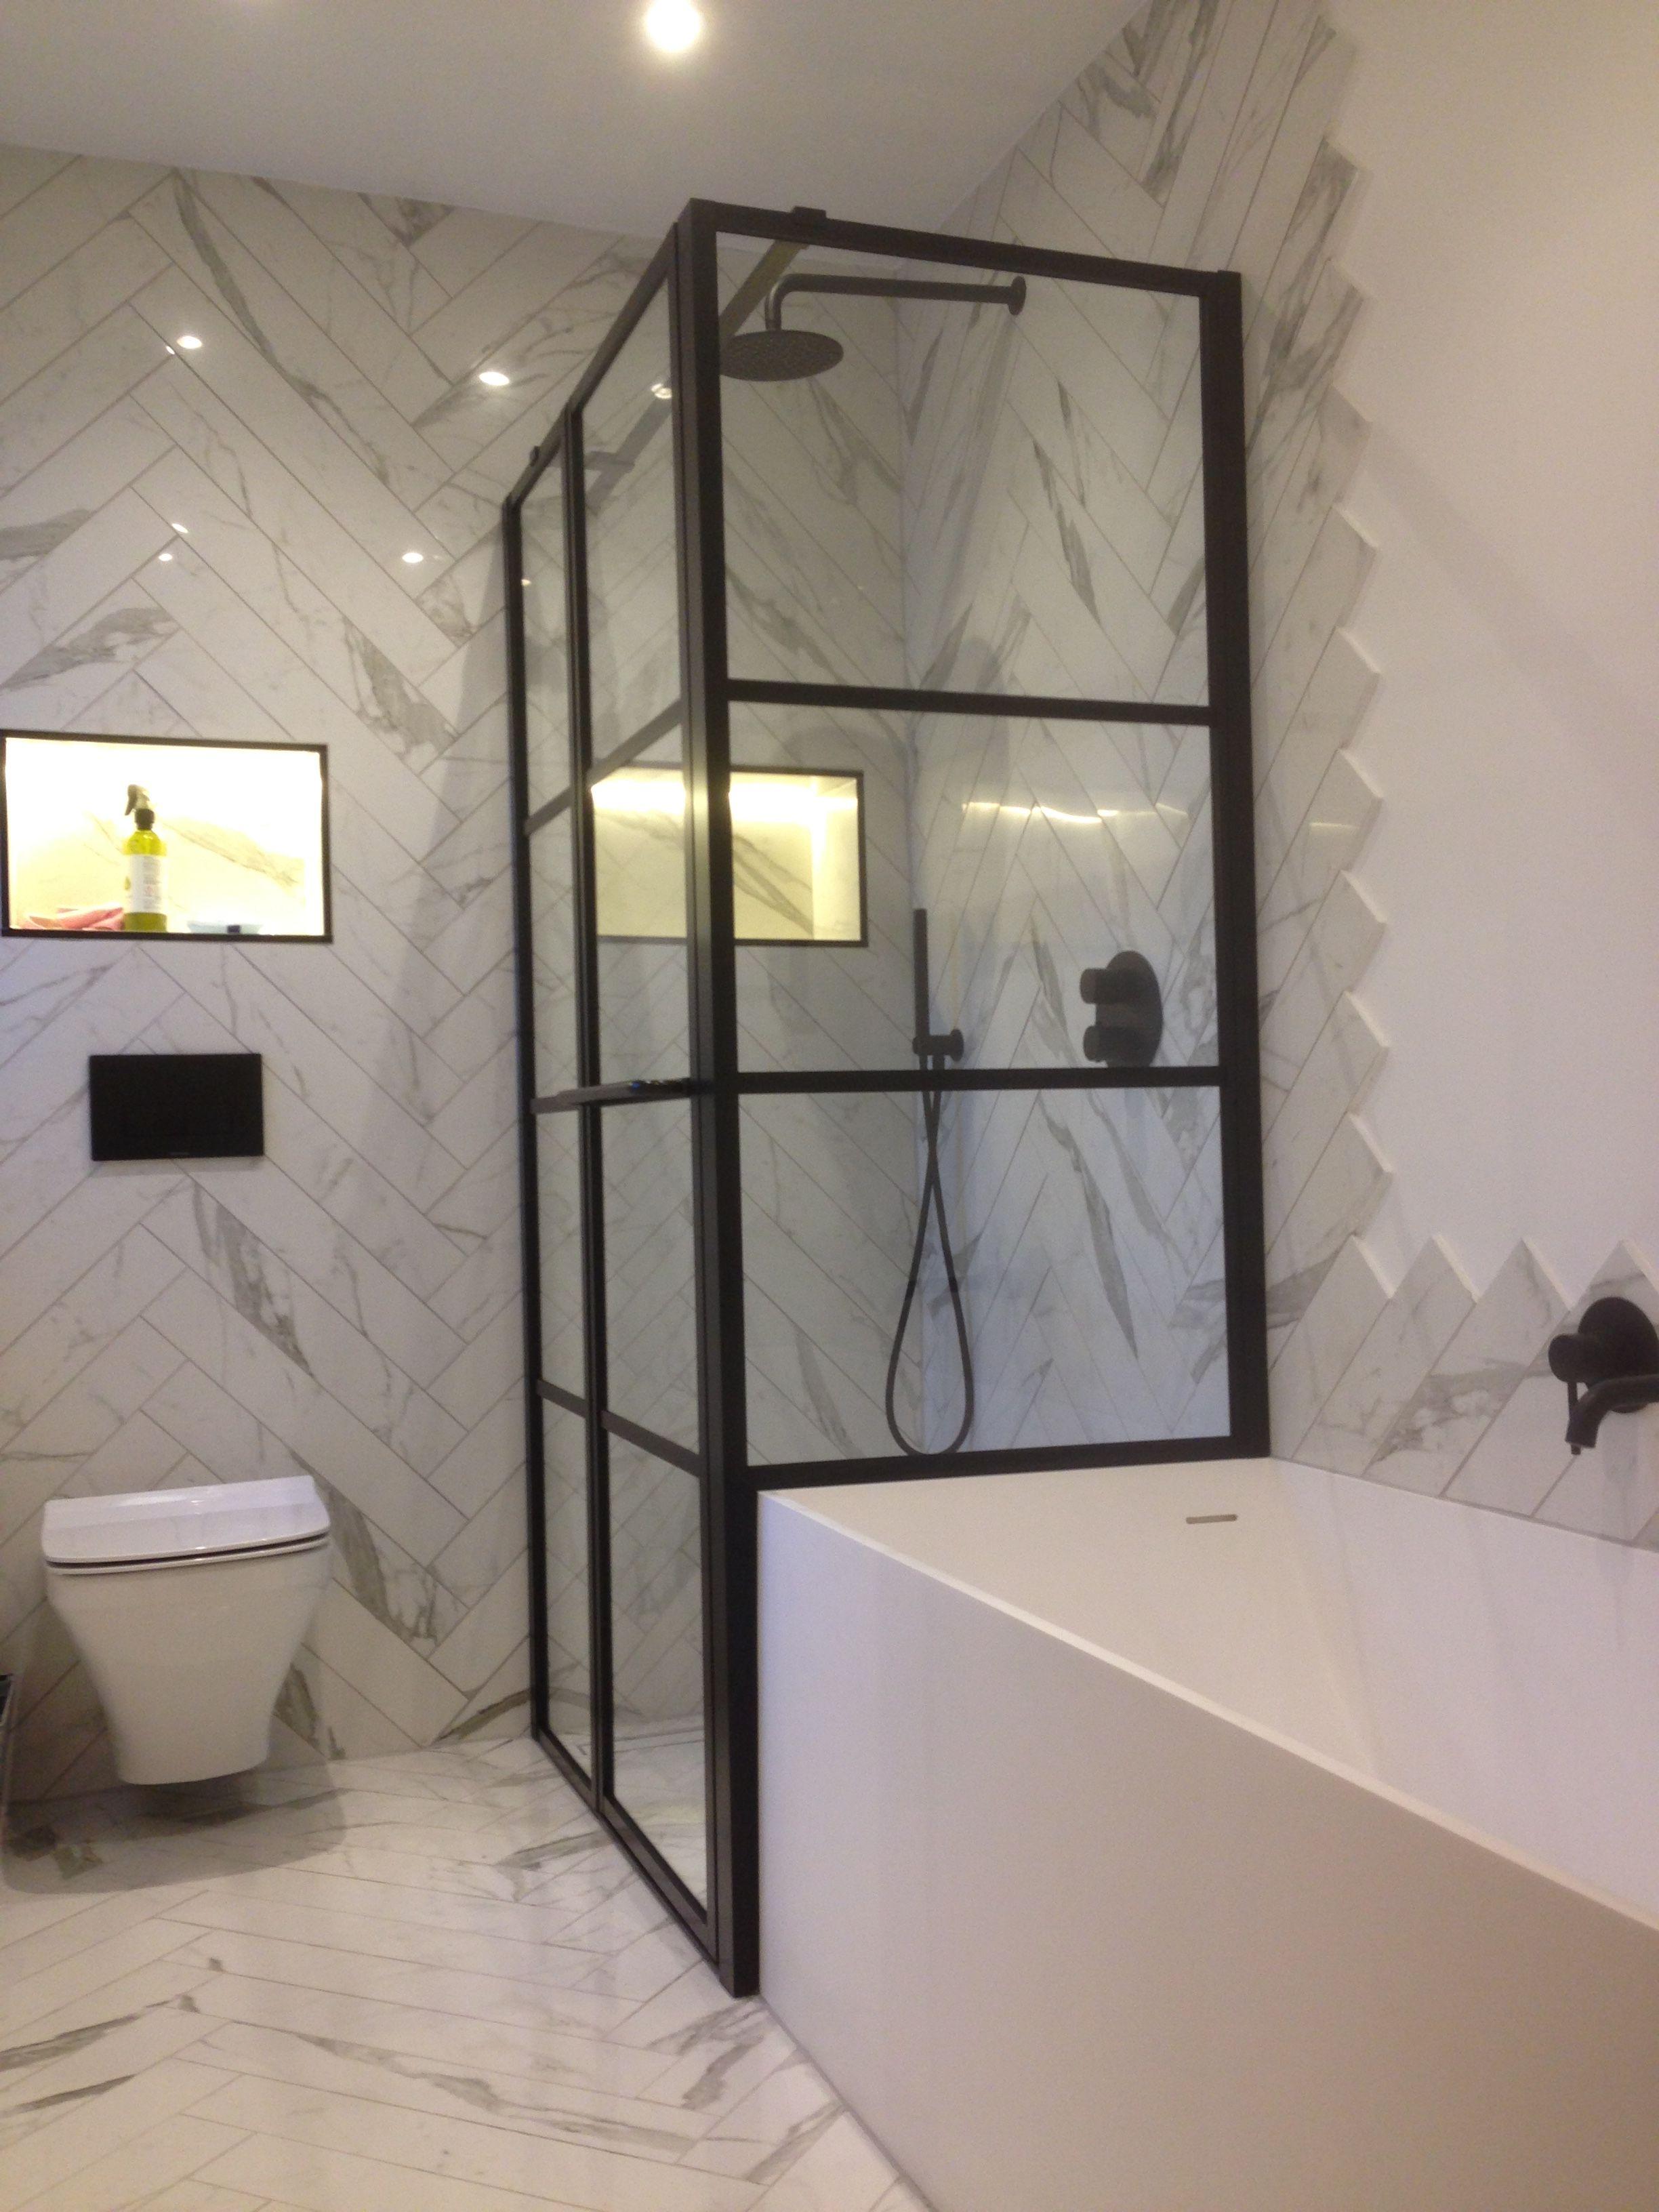 Stylish And Large Black Framed Grid Effect Shower Enclosure In